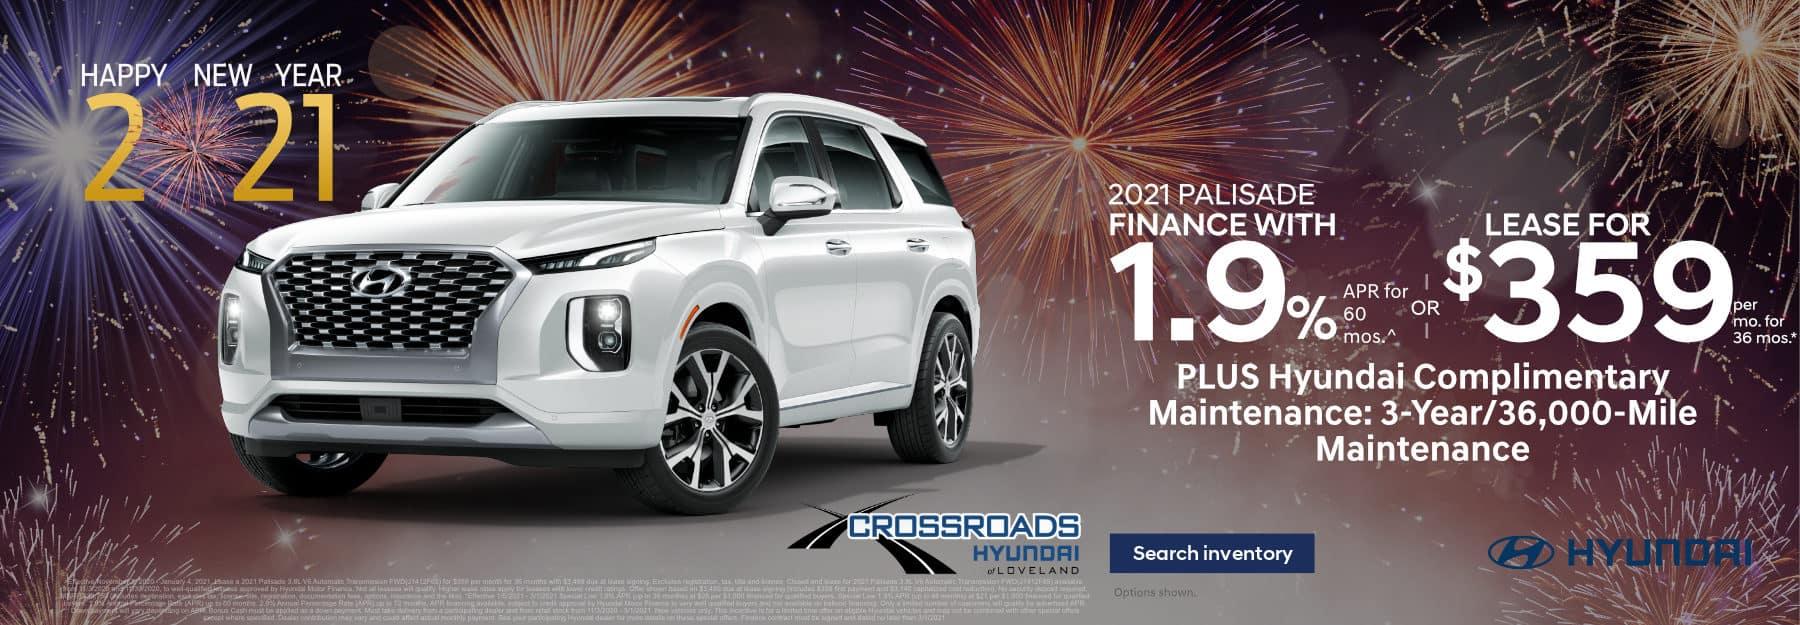 January_2021_PALISADE_CROSSROADS_Hyundai